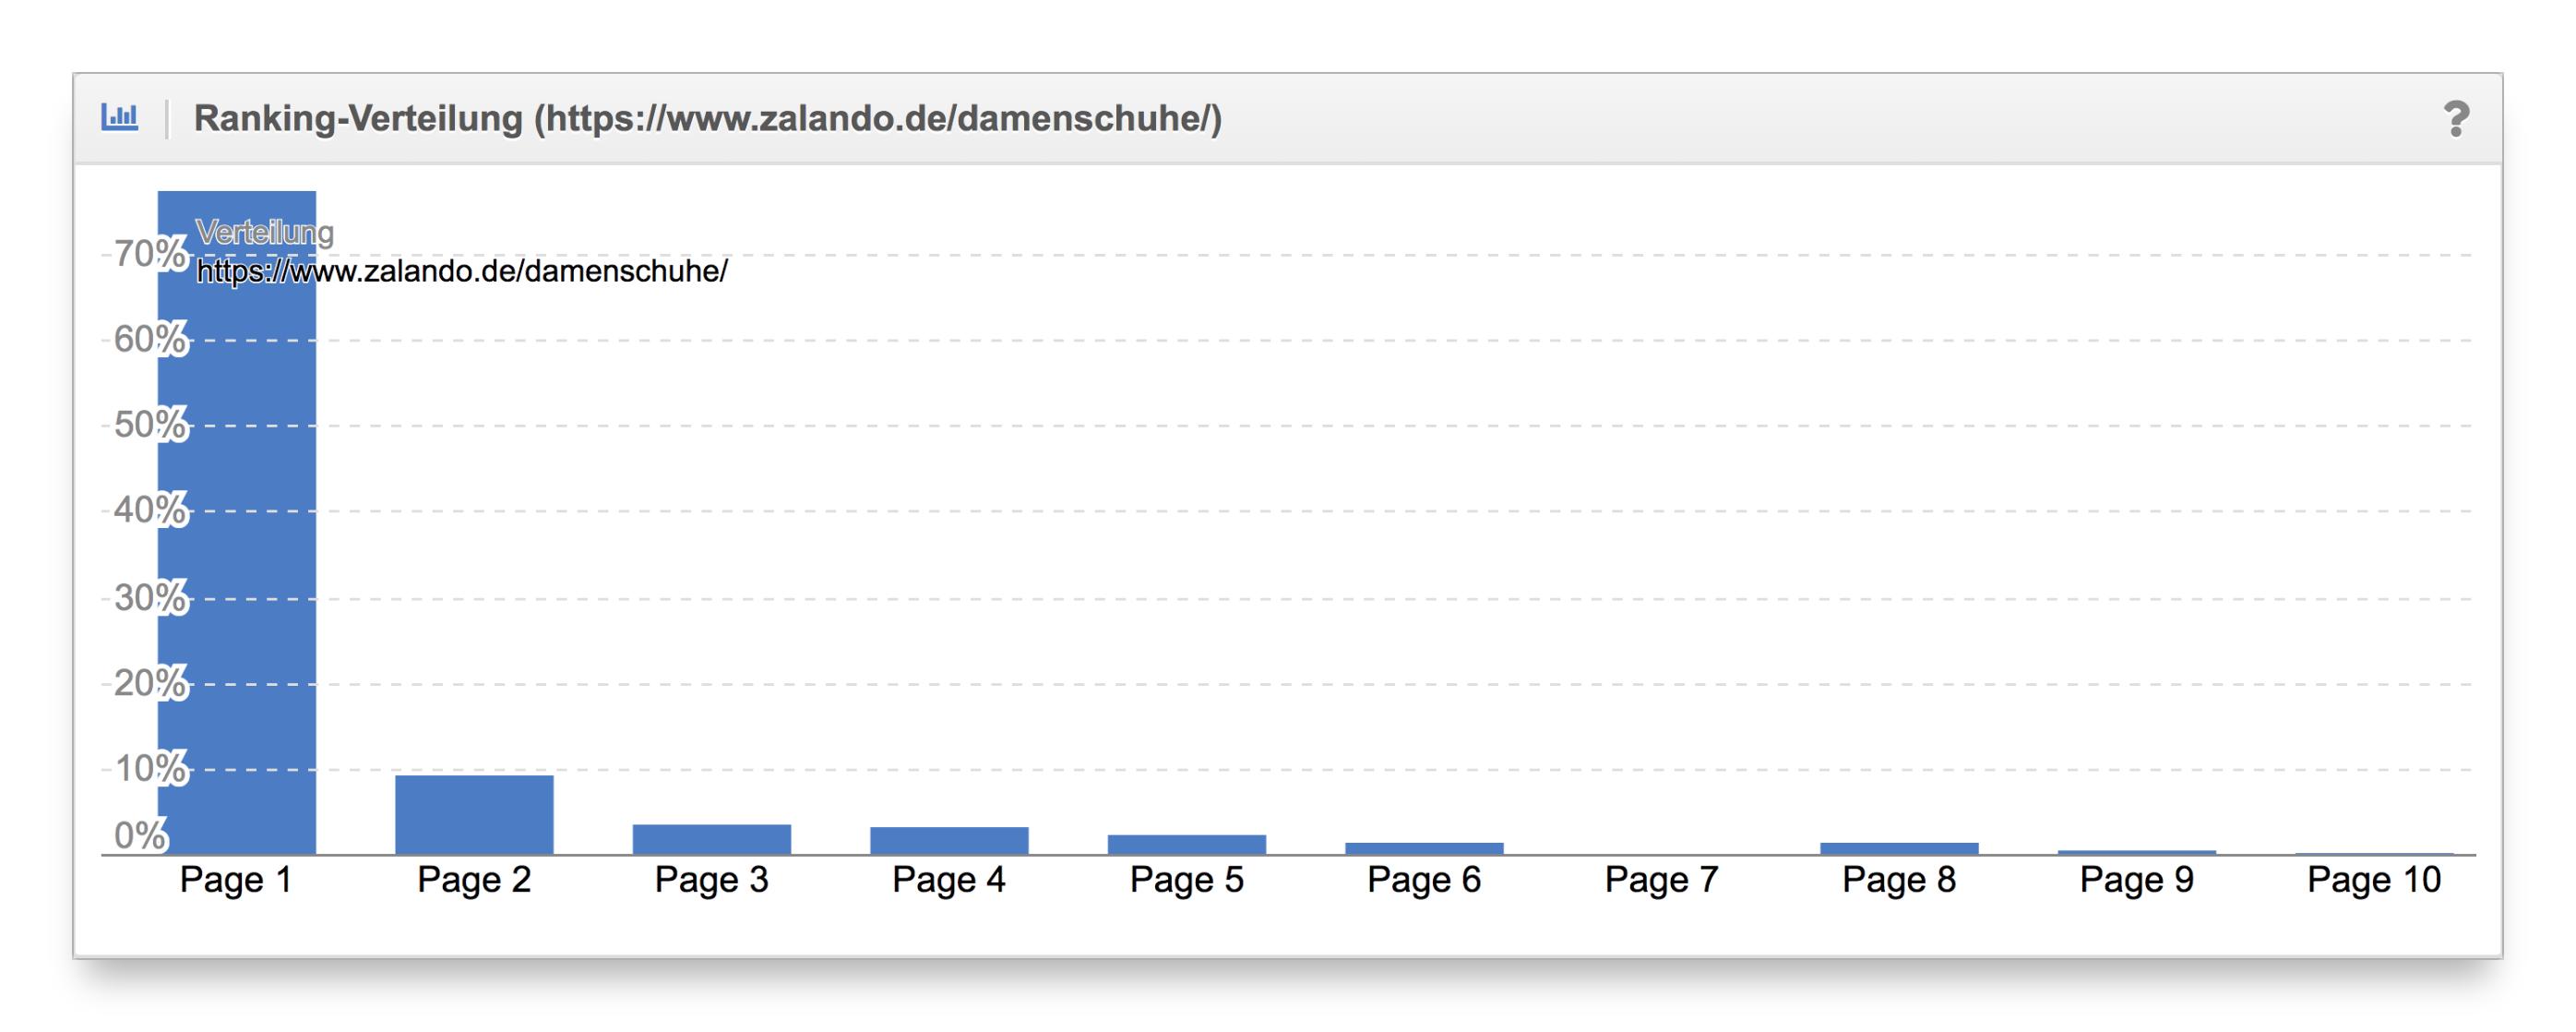 Vergleich Ranking-Verteilung Content-Formate zalando.de